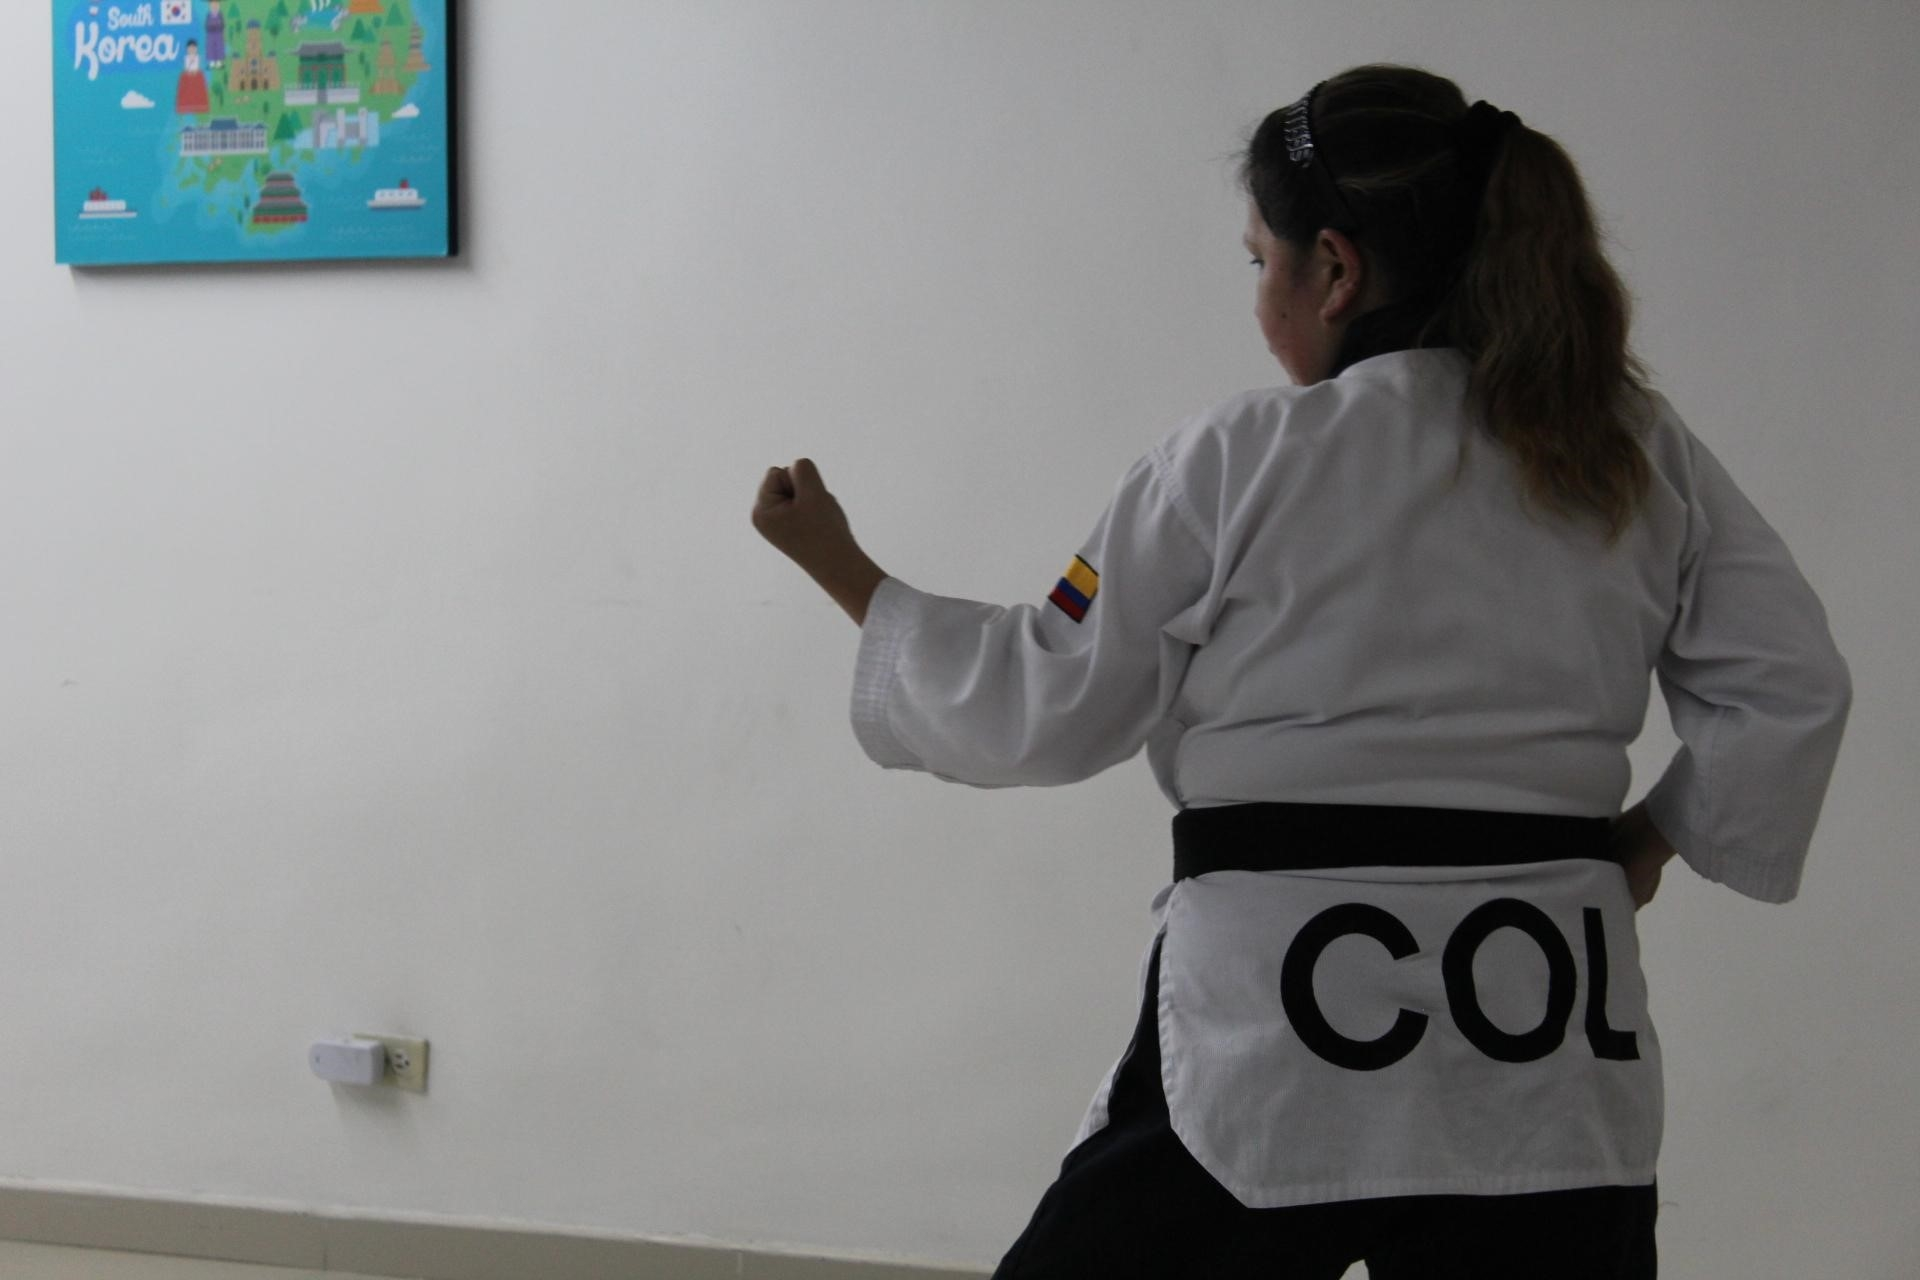 Jhormary Rojas entrenando. Fotos: Daniela Mafla Zafra